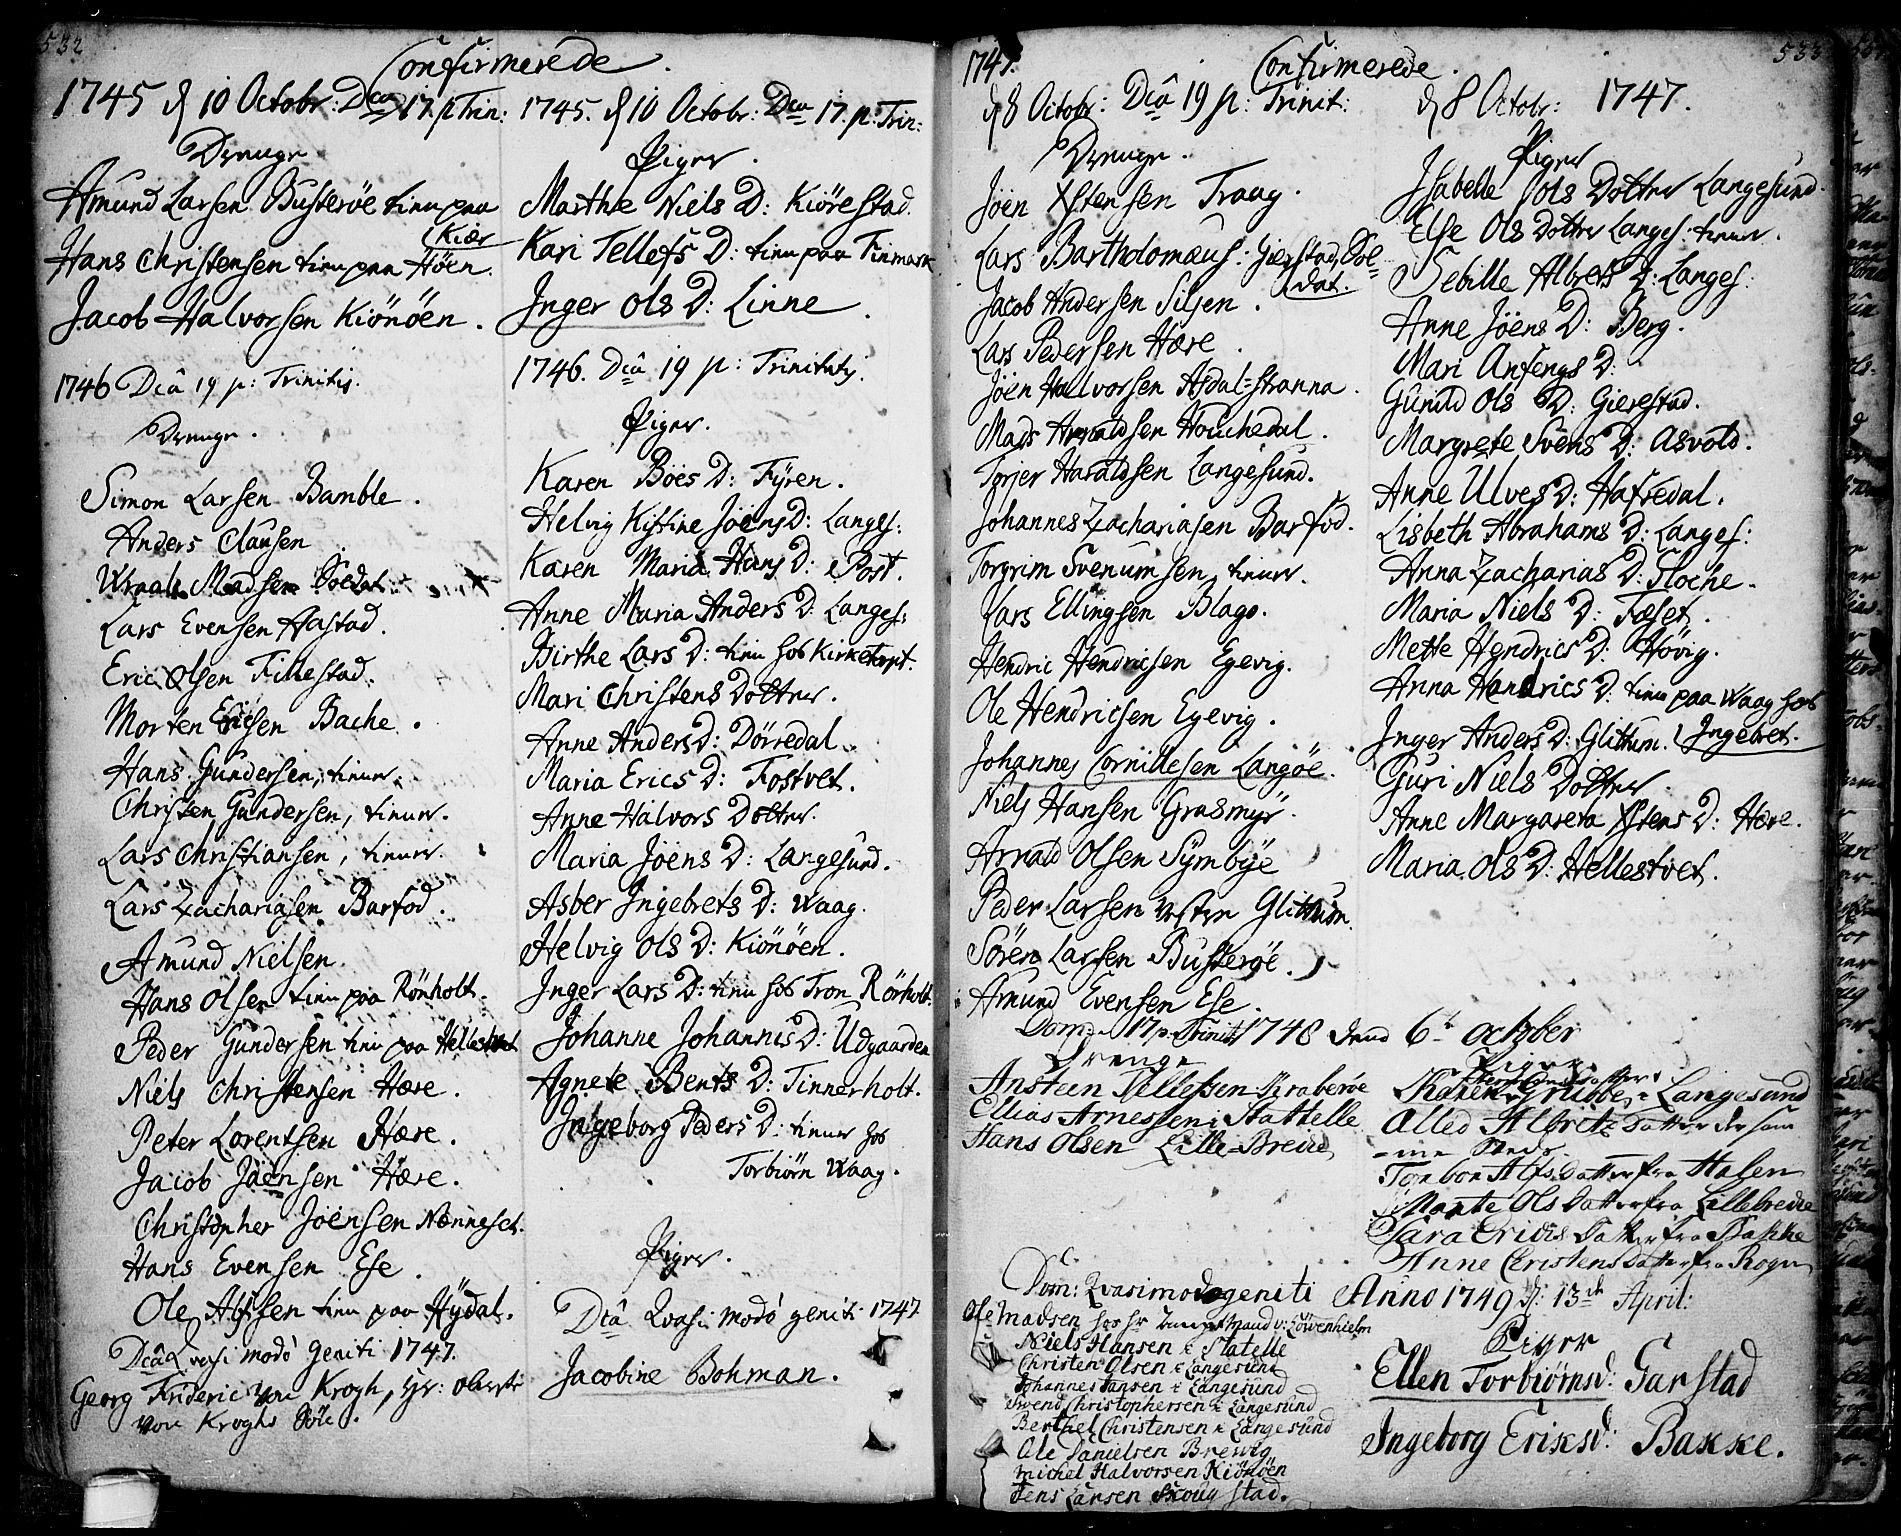 SAKO, Bamble kirkebøker, F/Fa/L0001: Ministerialbok nr. I 1, 1702-1774, s. 532-533